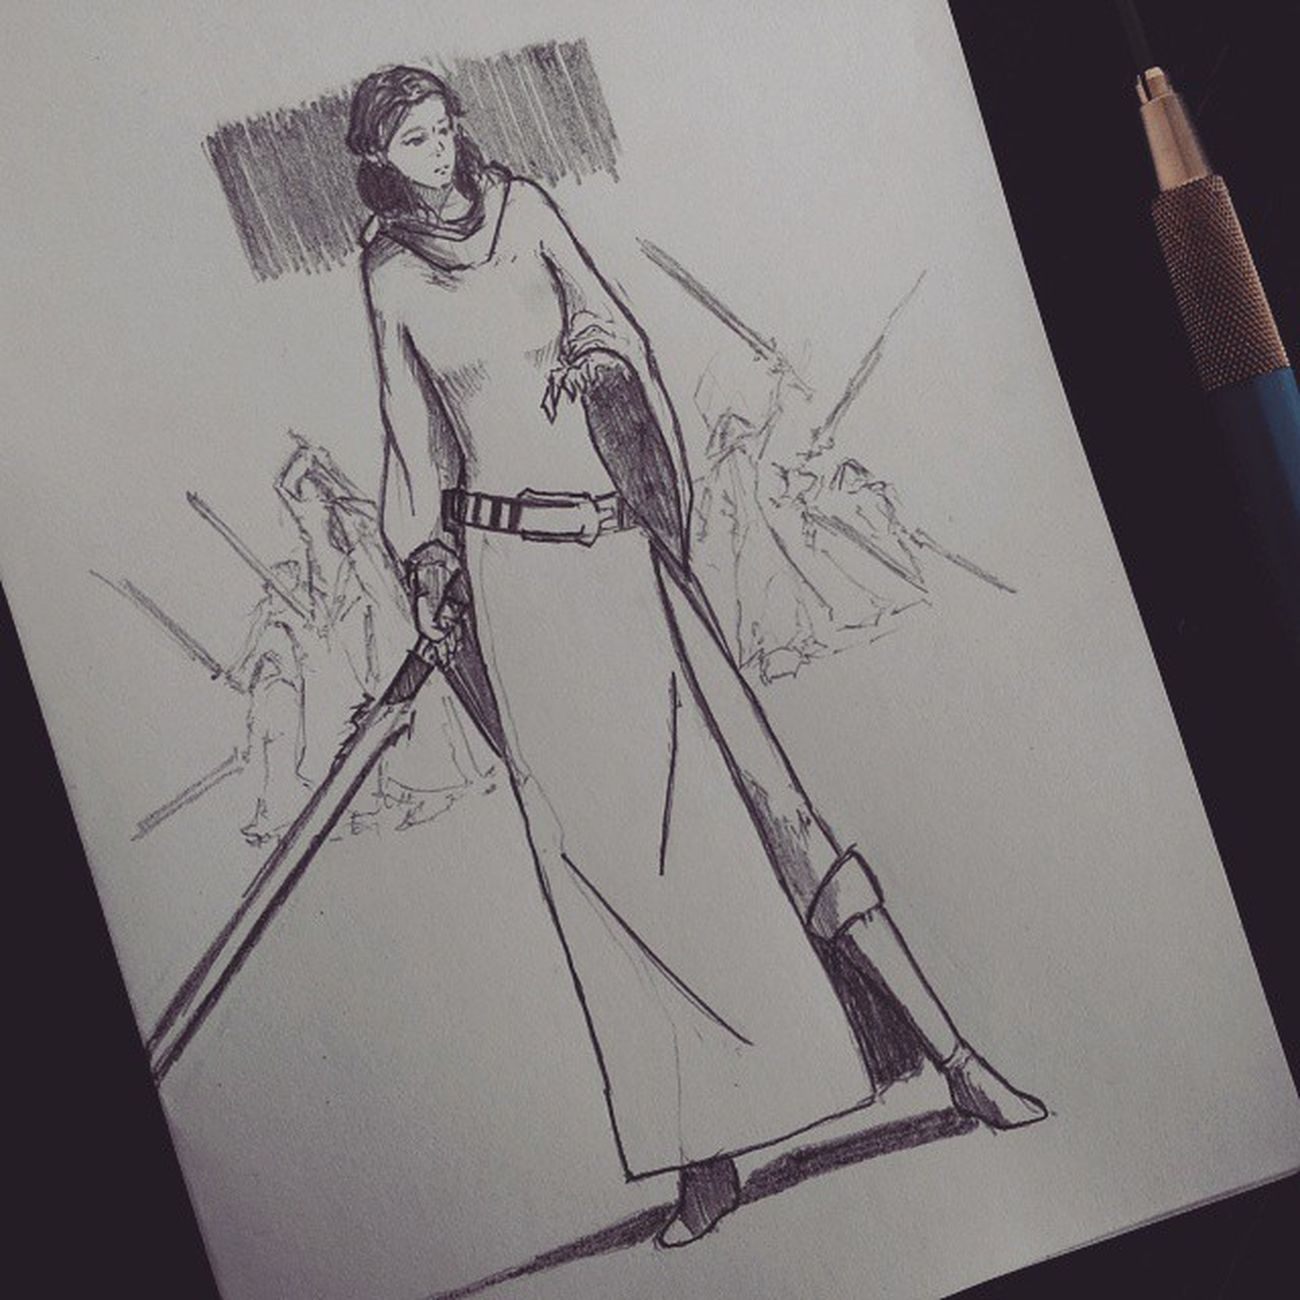 Lunch doodle. Jedi Leia Organa Solo Starwars MayThe4thBeWithYou Jedi Princess leia lightsaber